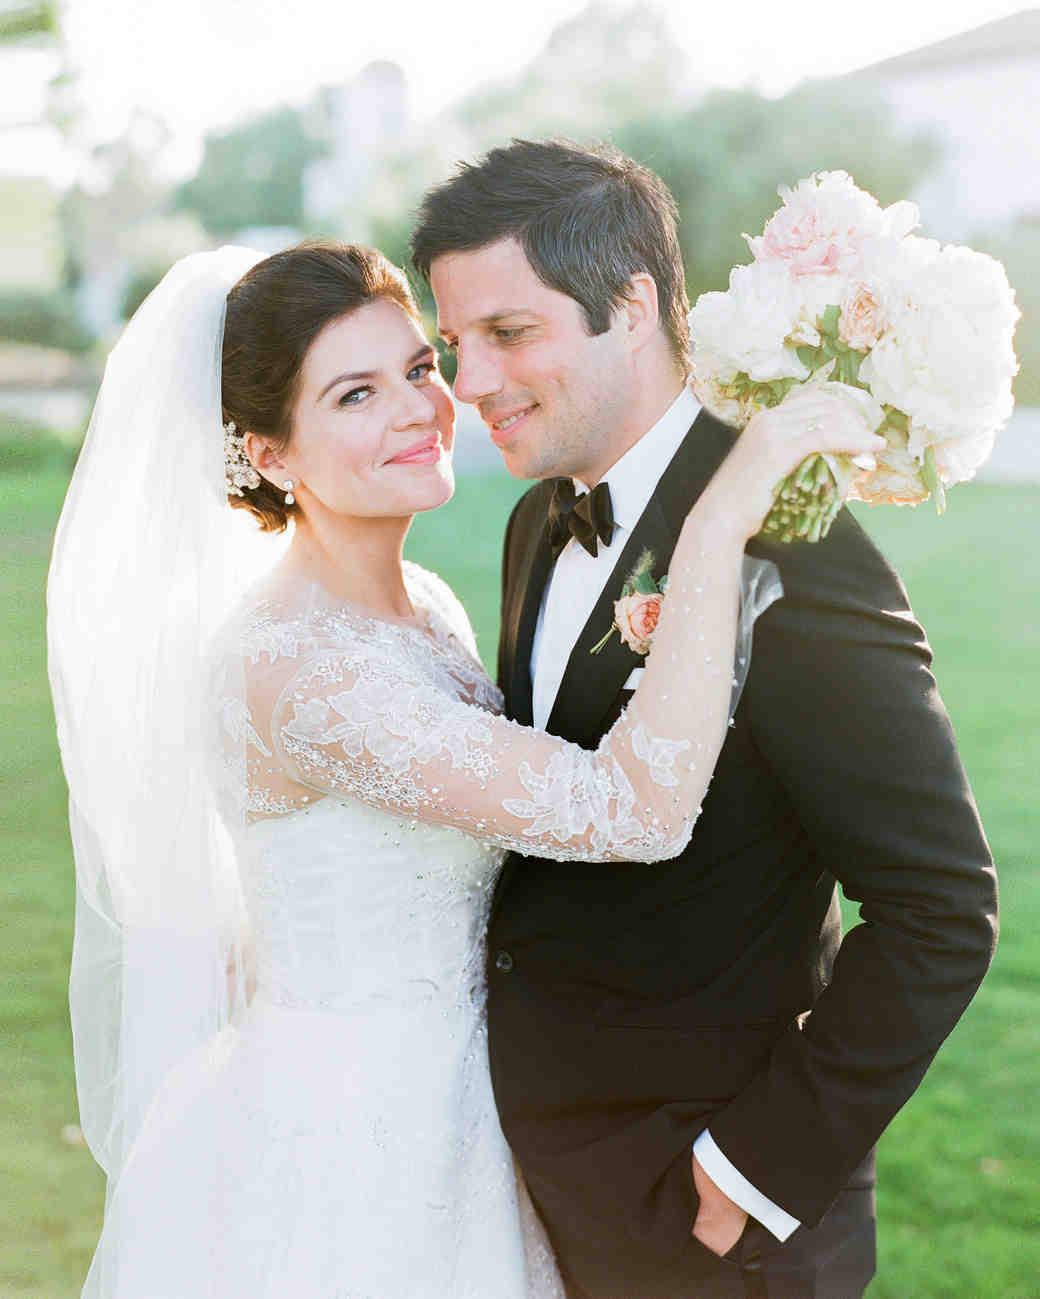 casey-david-wedding-ojai-0972-s111709.jpg